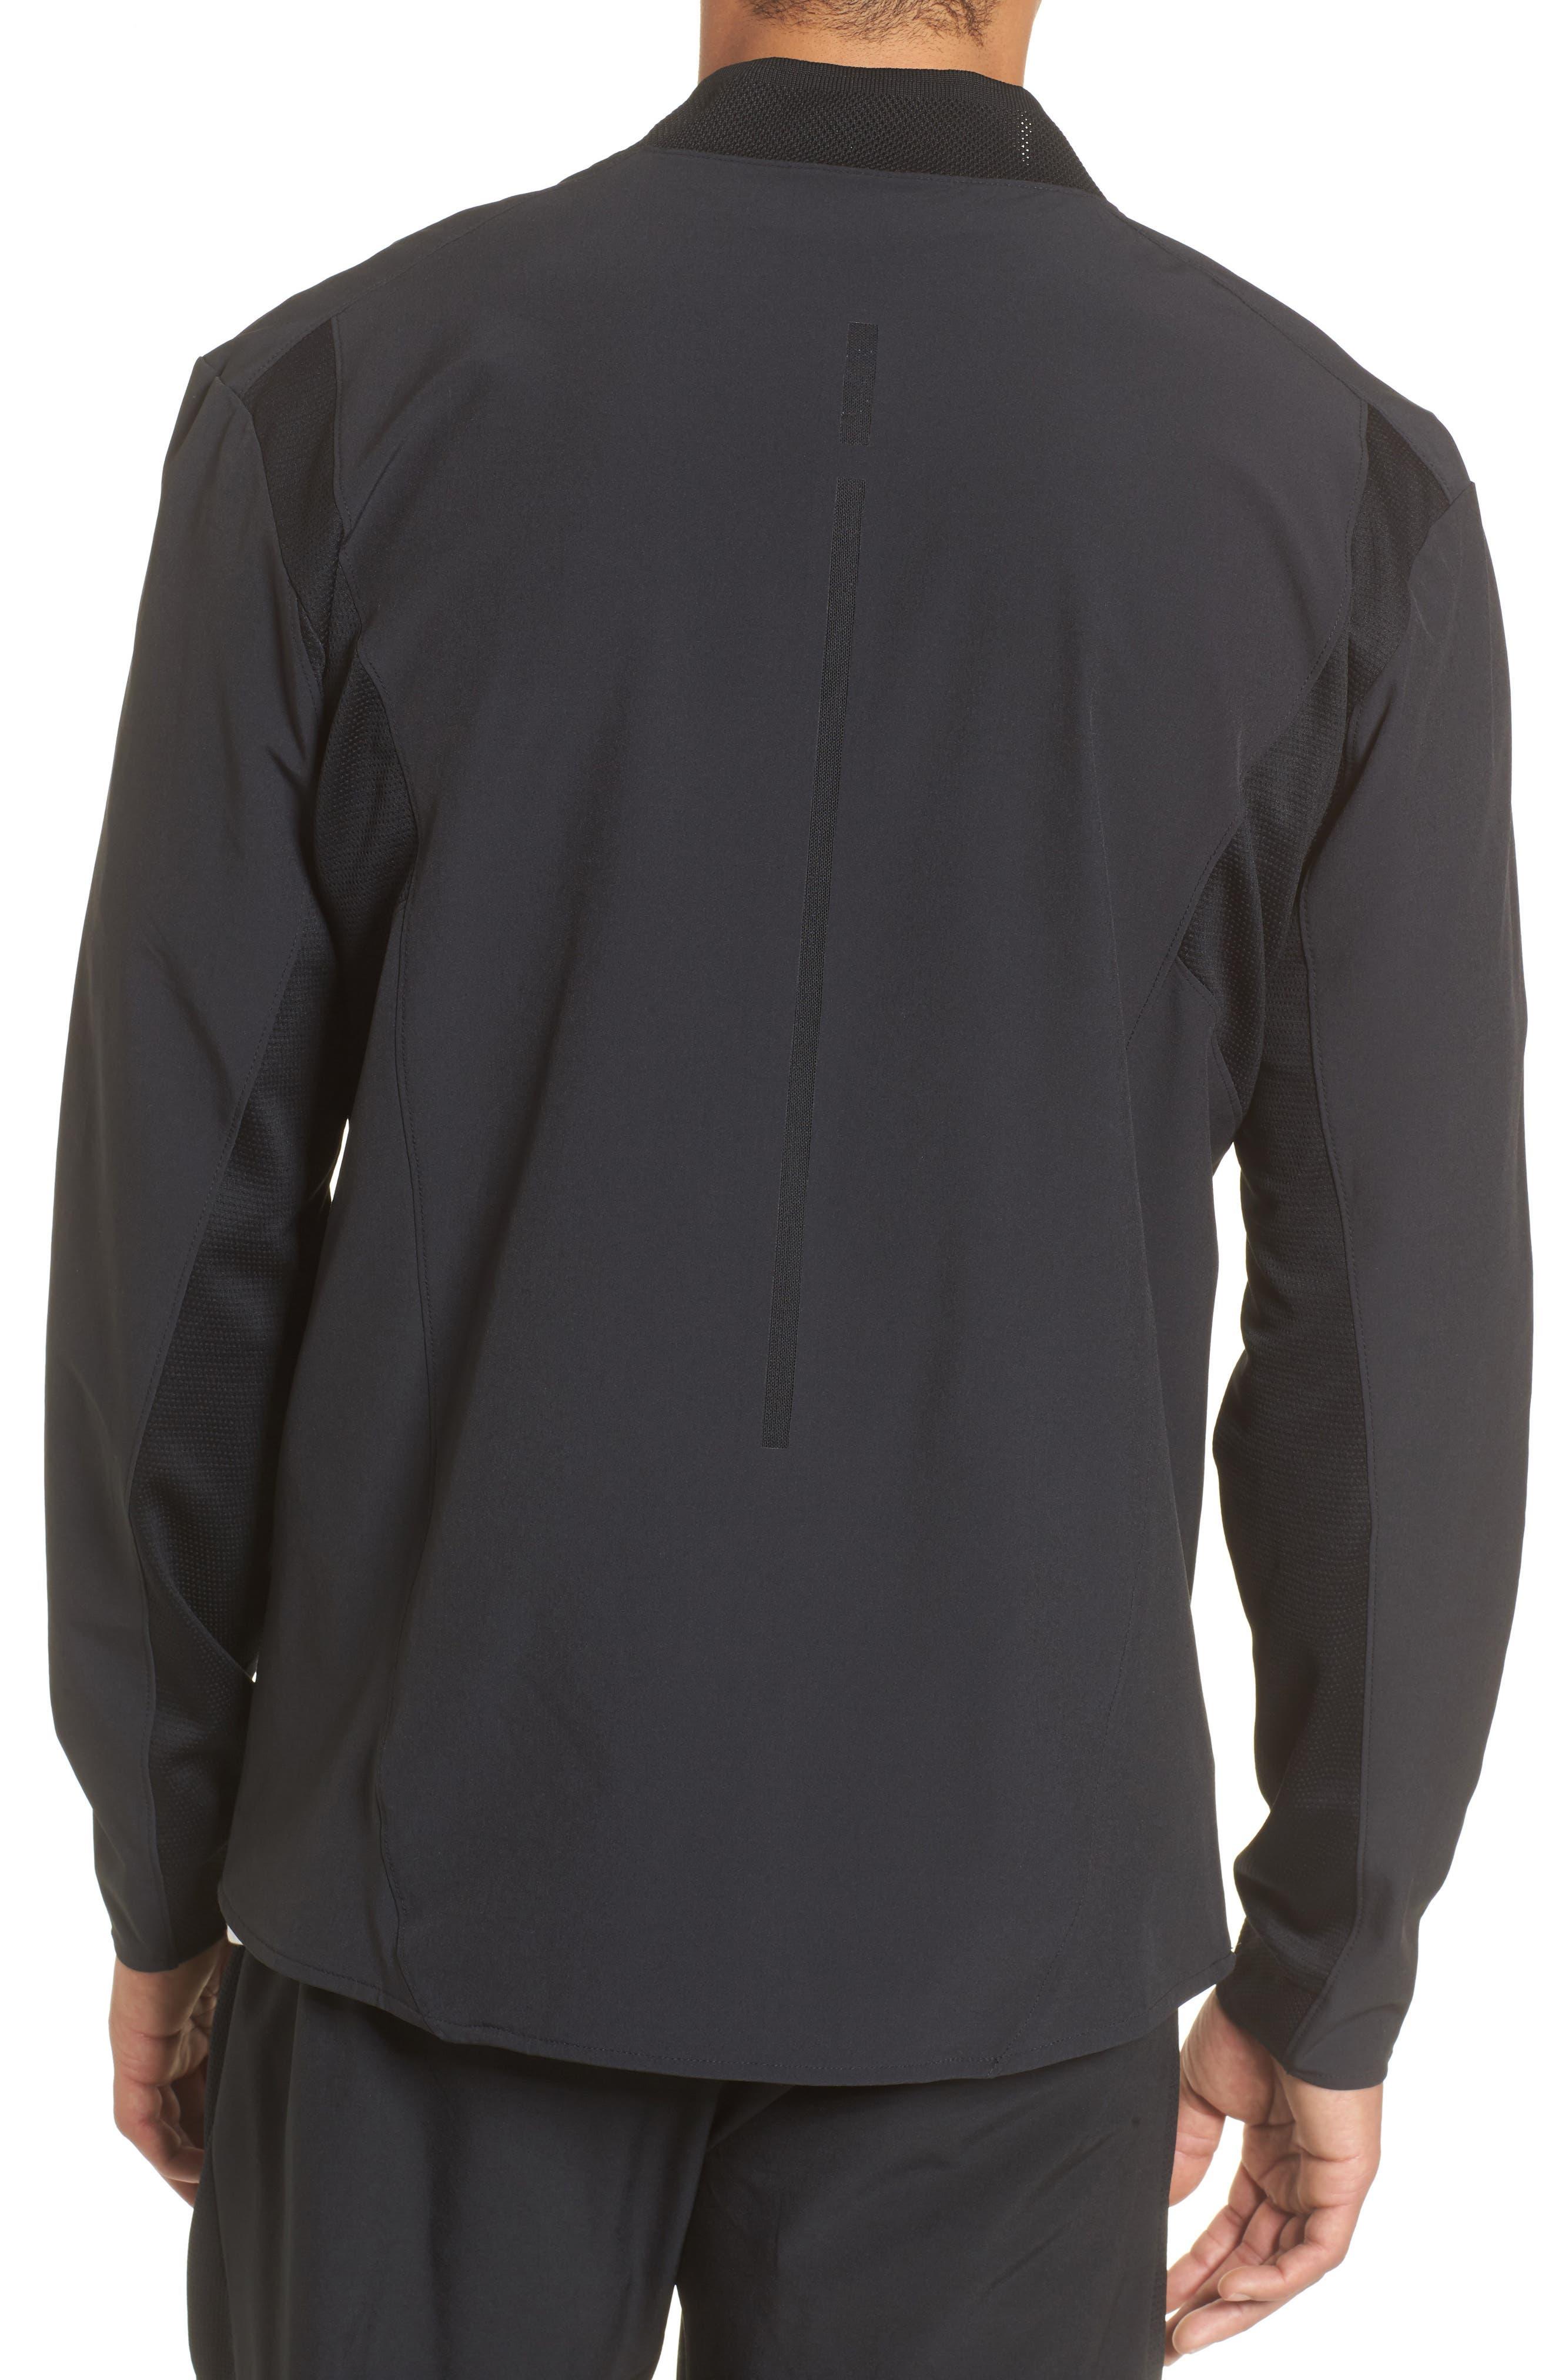 23 Alpha Dry Jacket,                             Alternate thumbnail 2, color,                             Black/ White